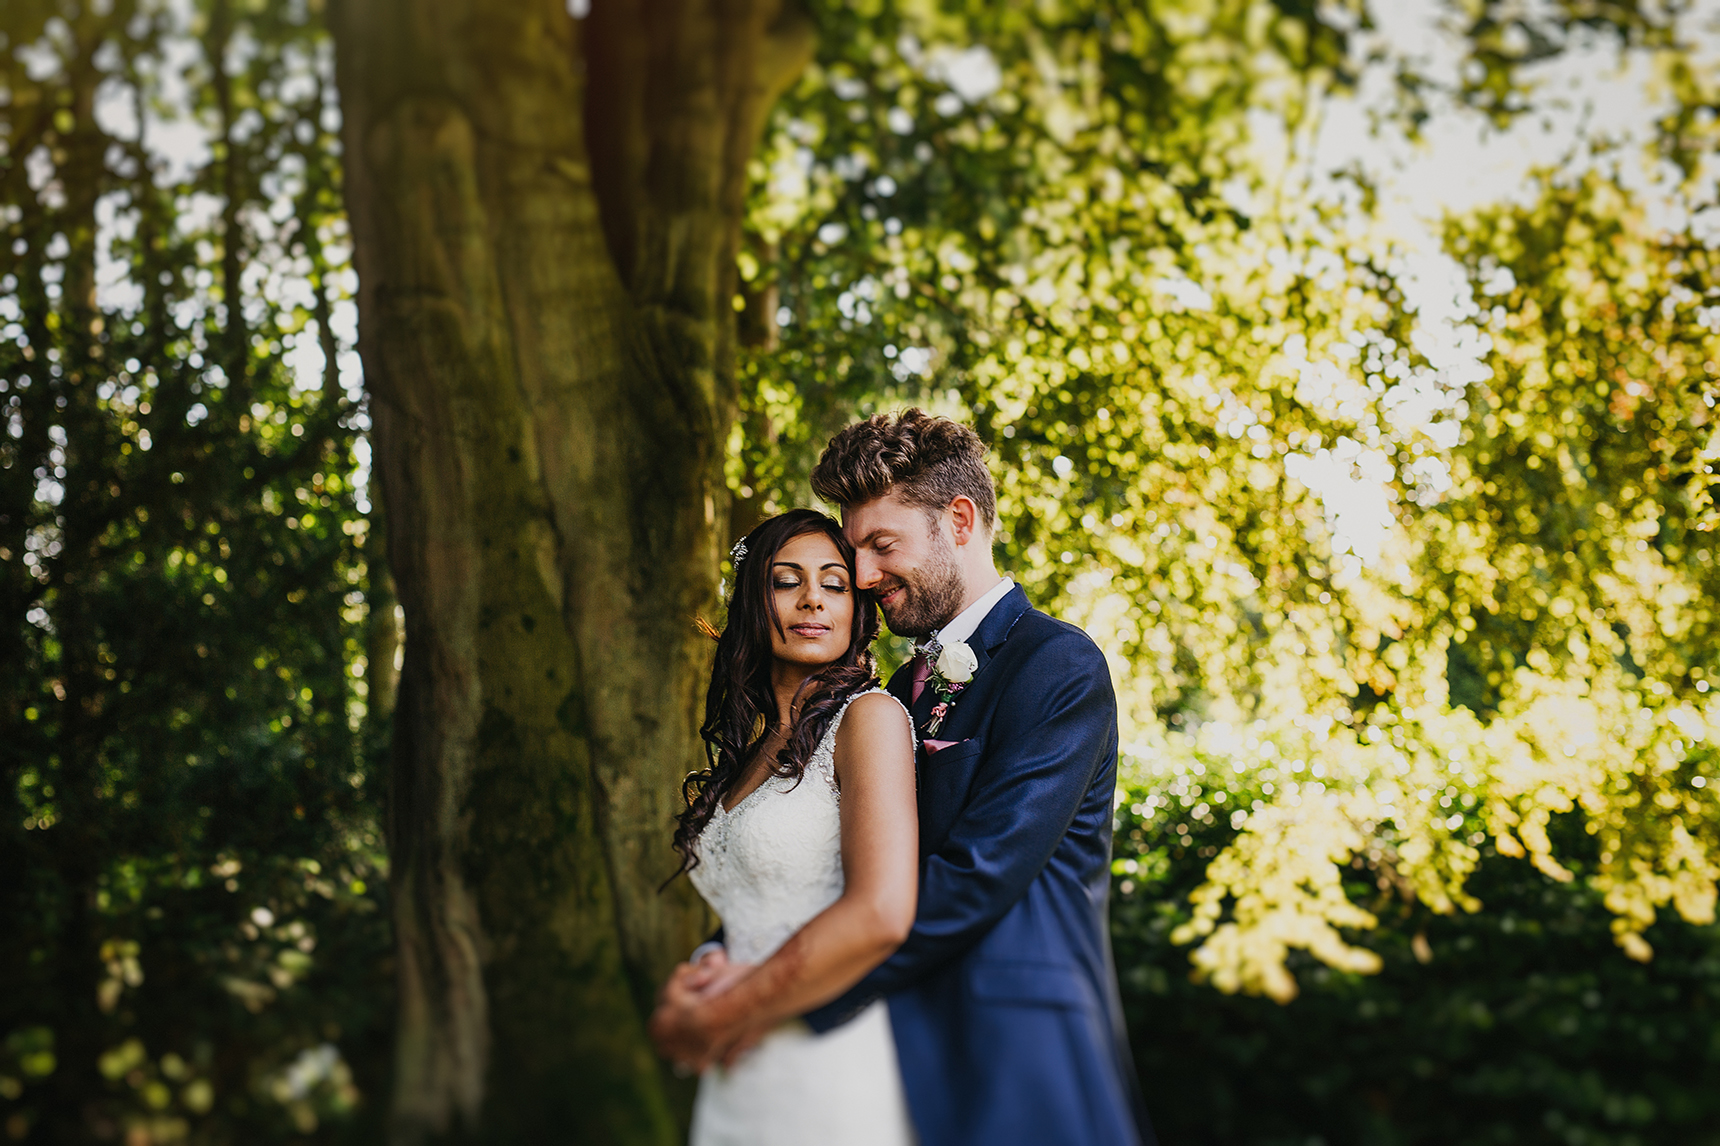 Newby Hall wedding photography